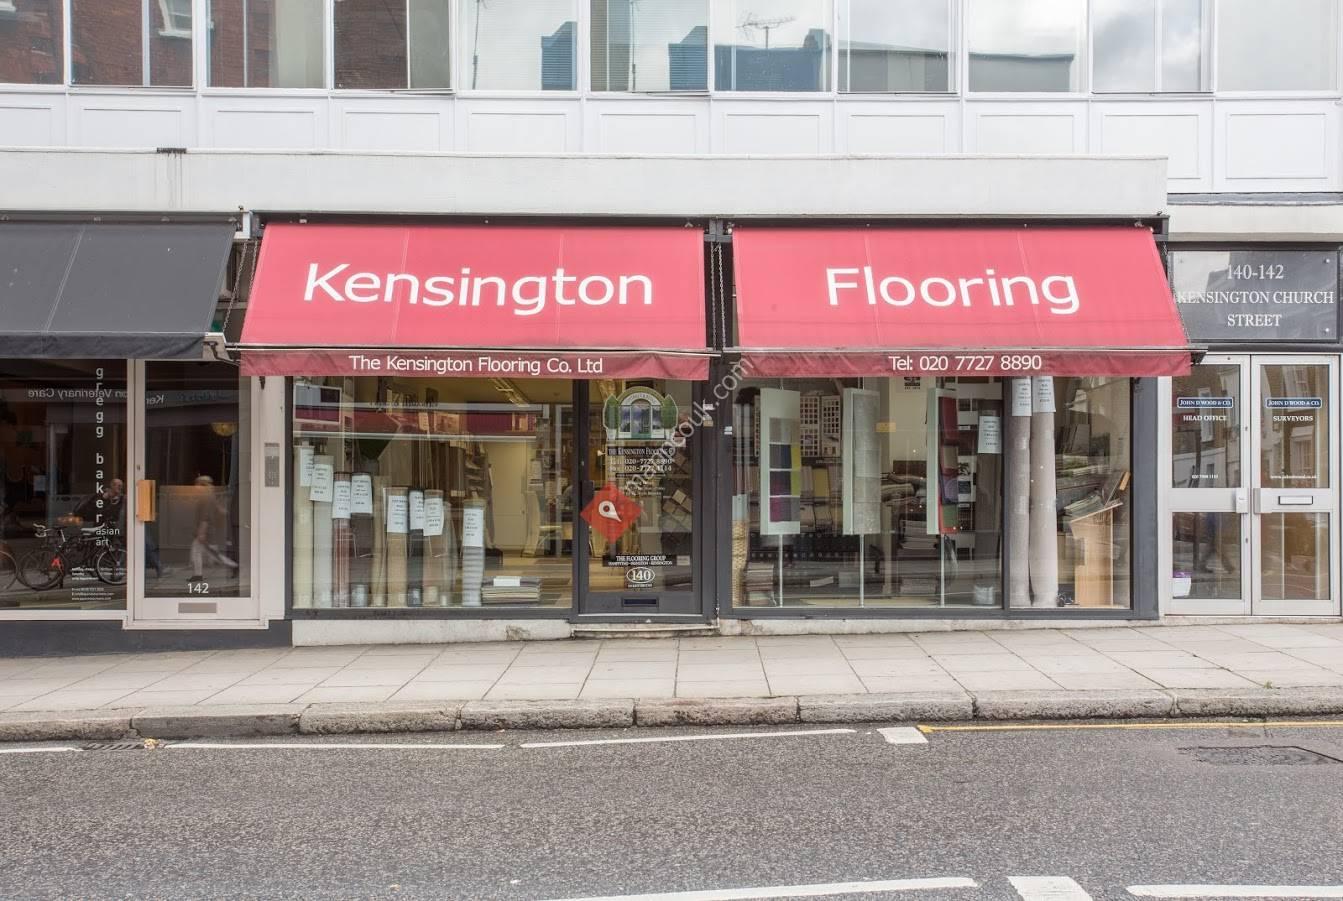 The Kensington Flooring Company